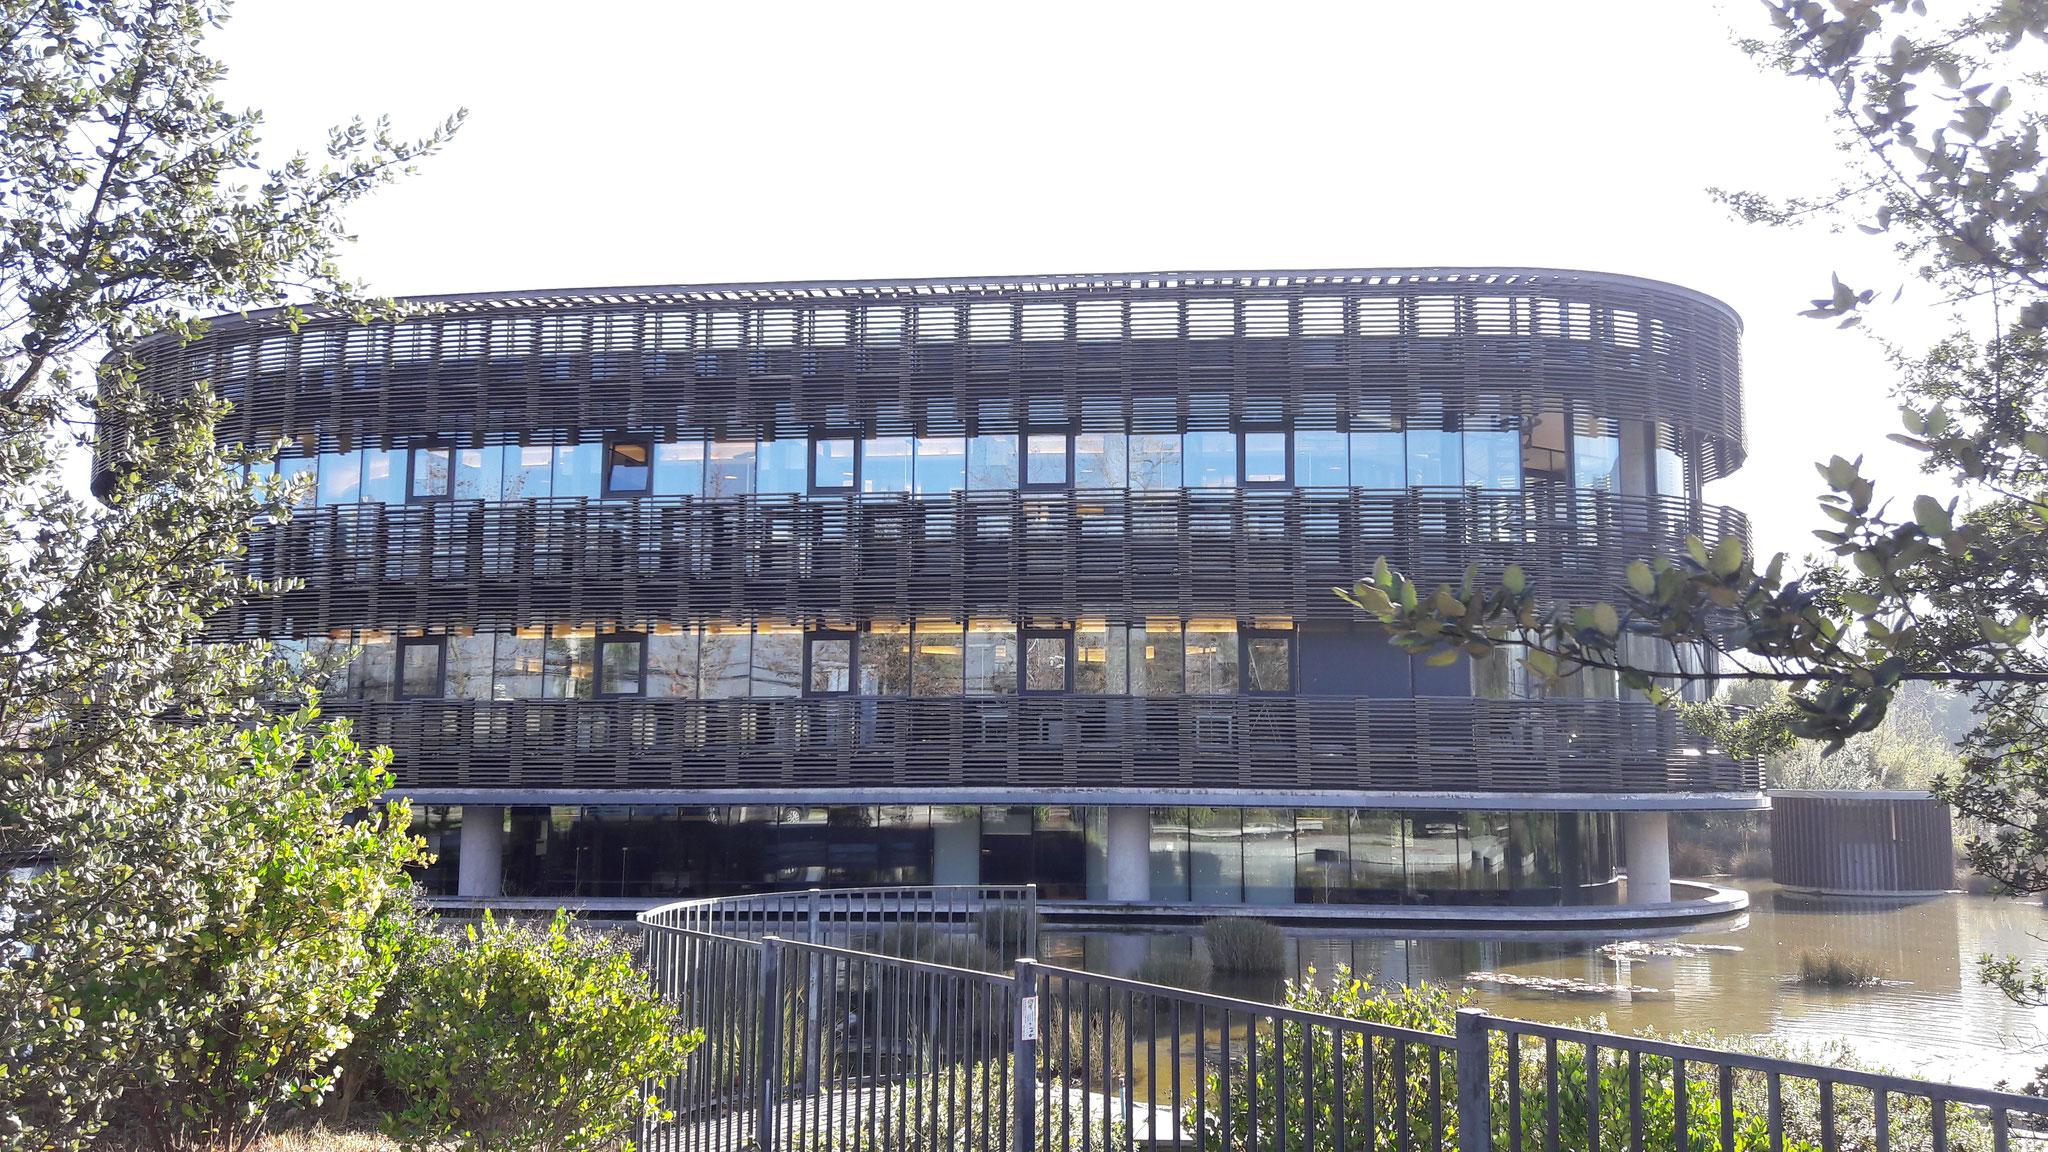 ENERGY NT, Edificio Transoceanica, Santiago, Chile